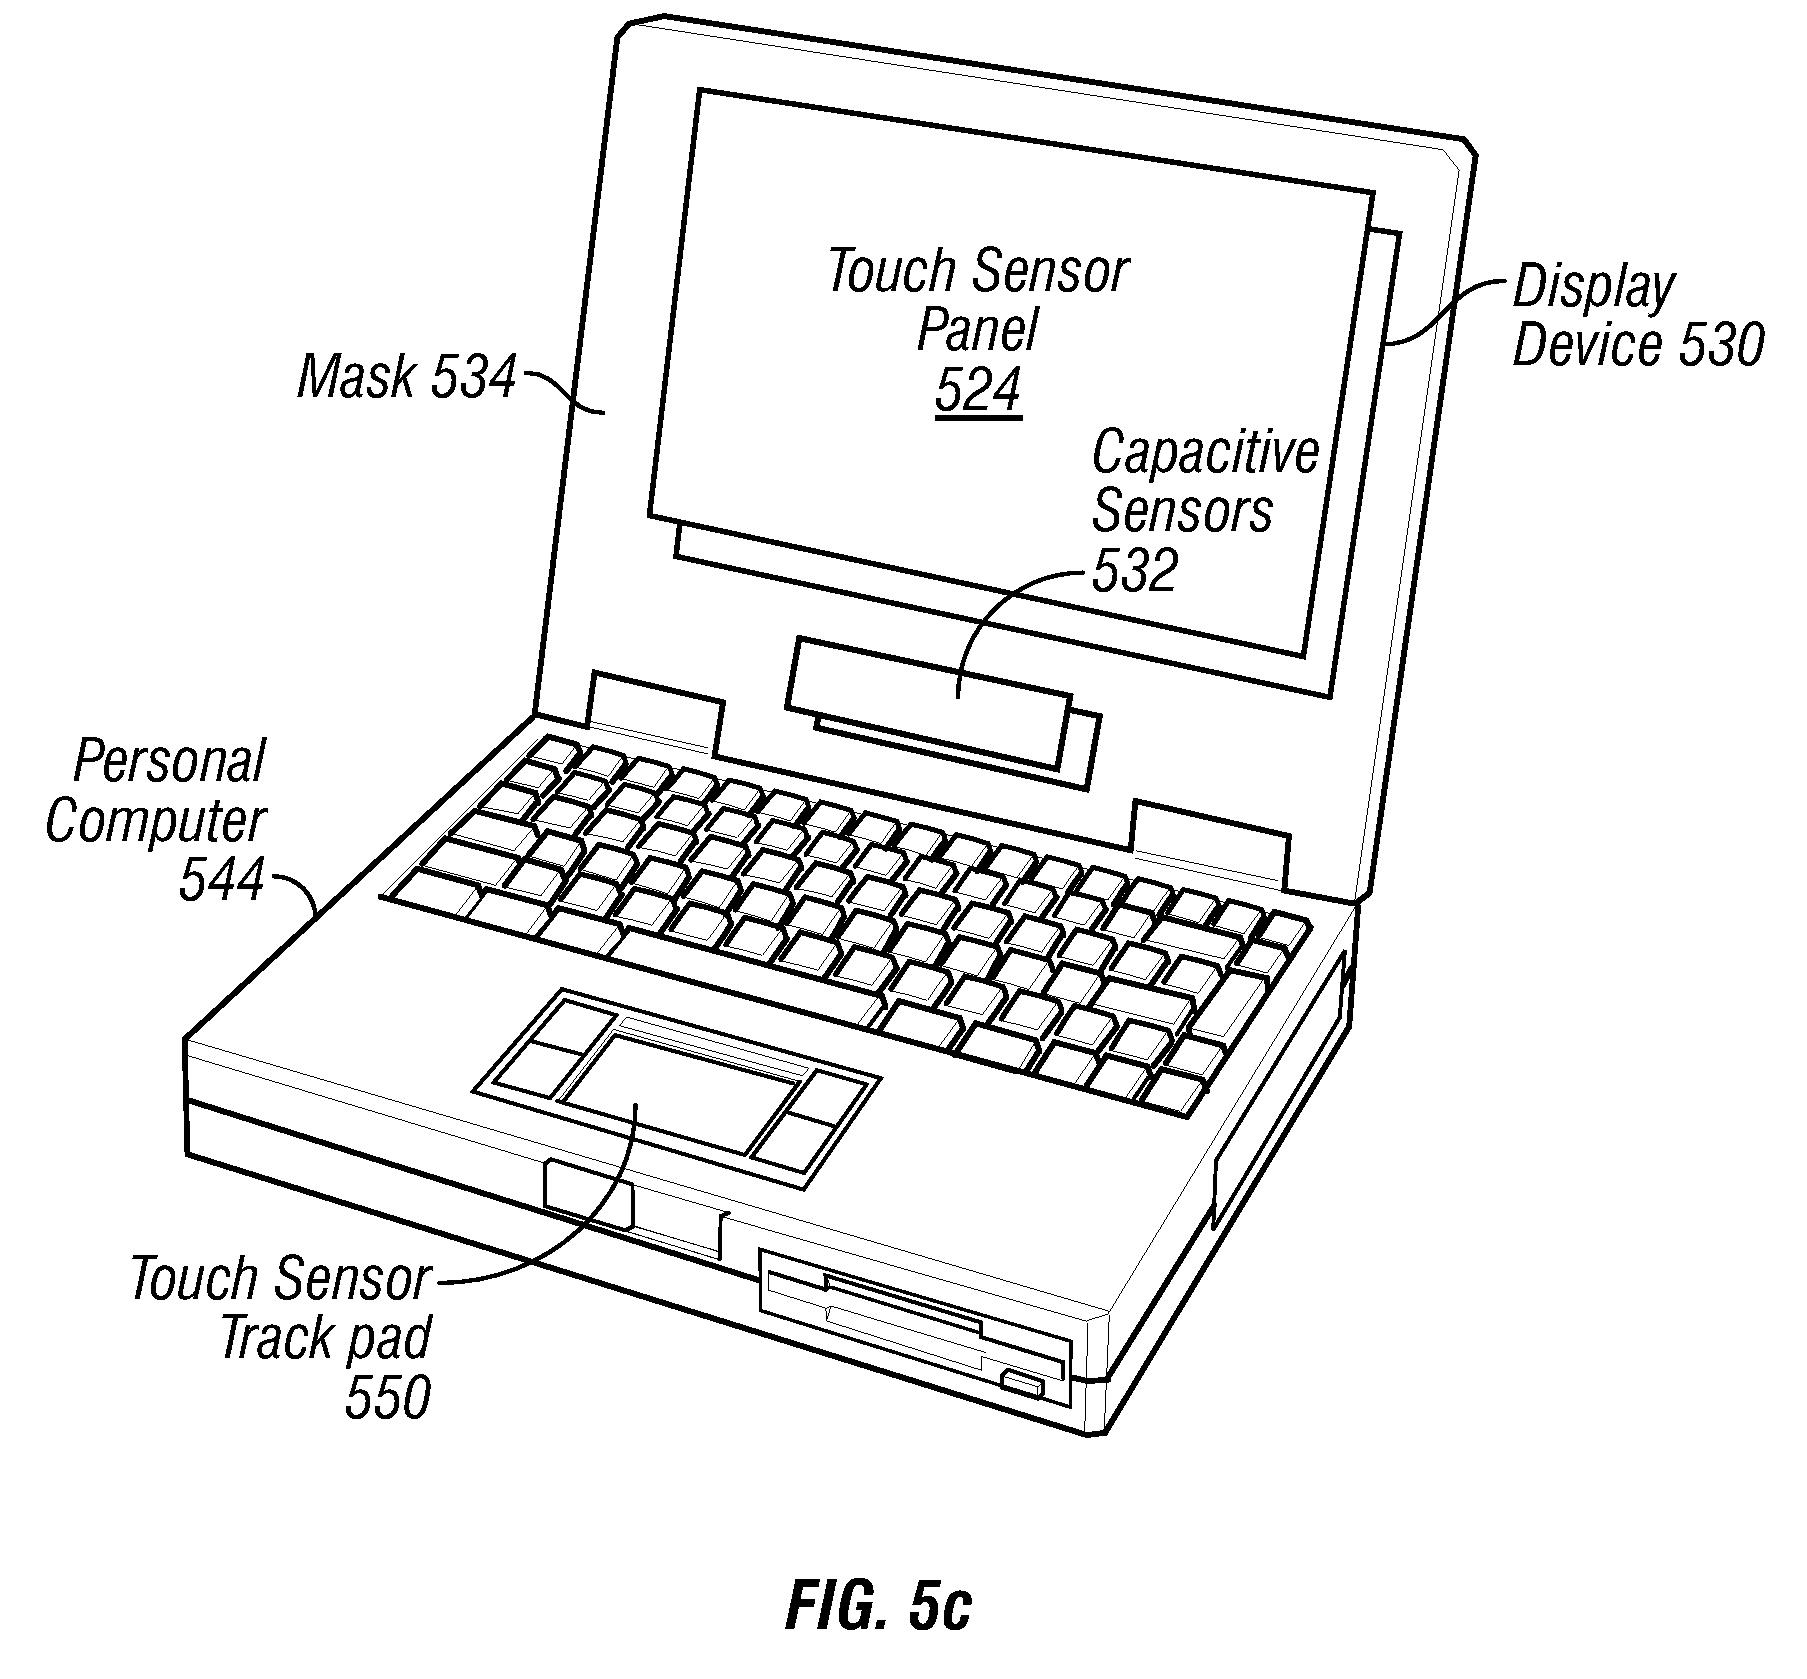 patente us20100026656